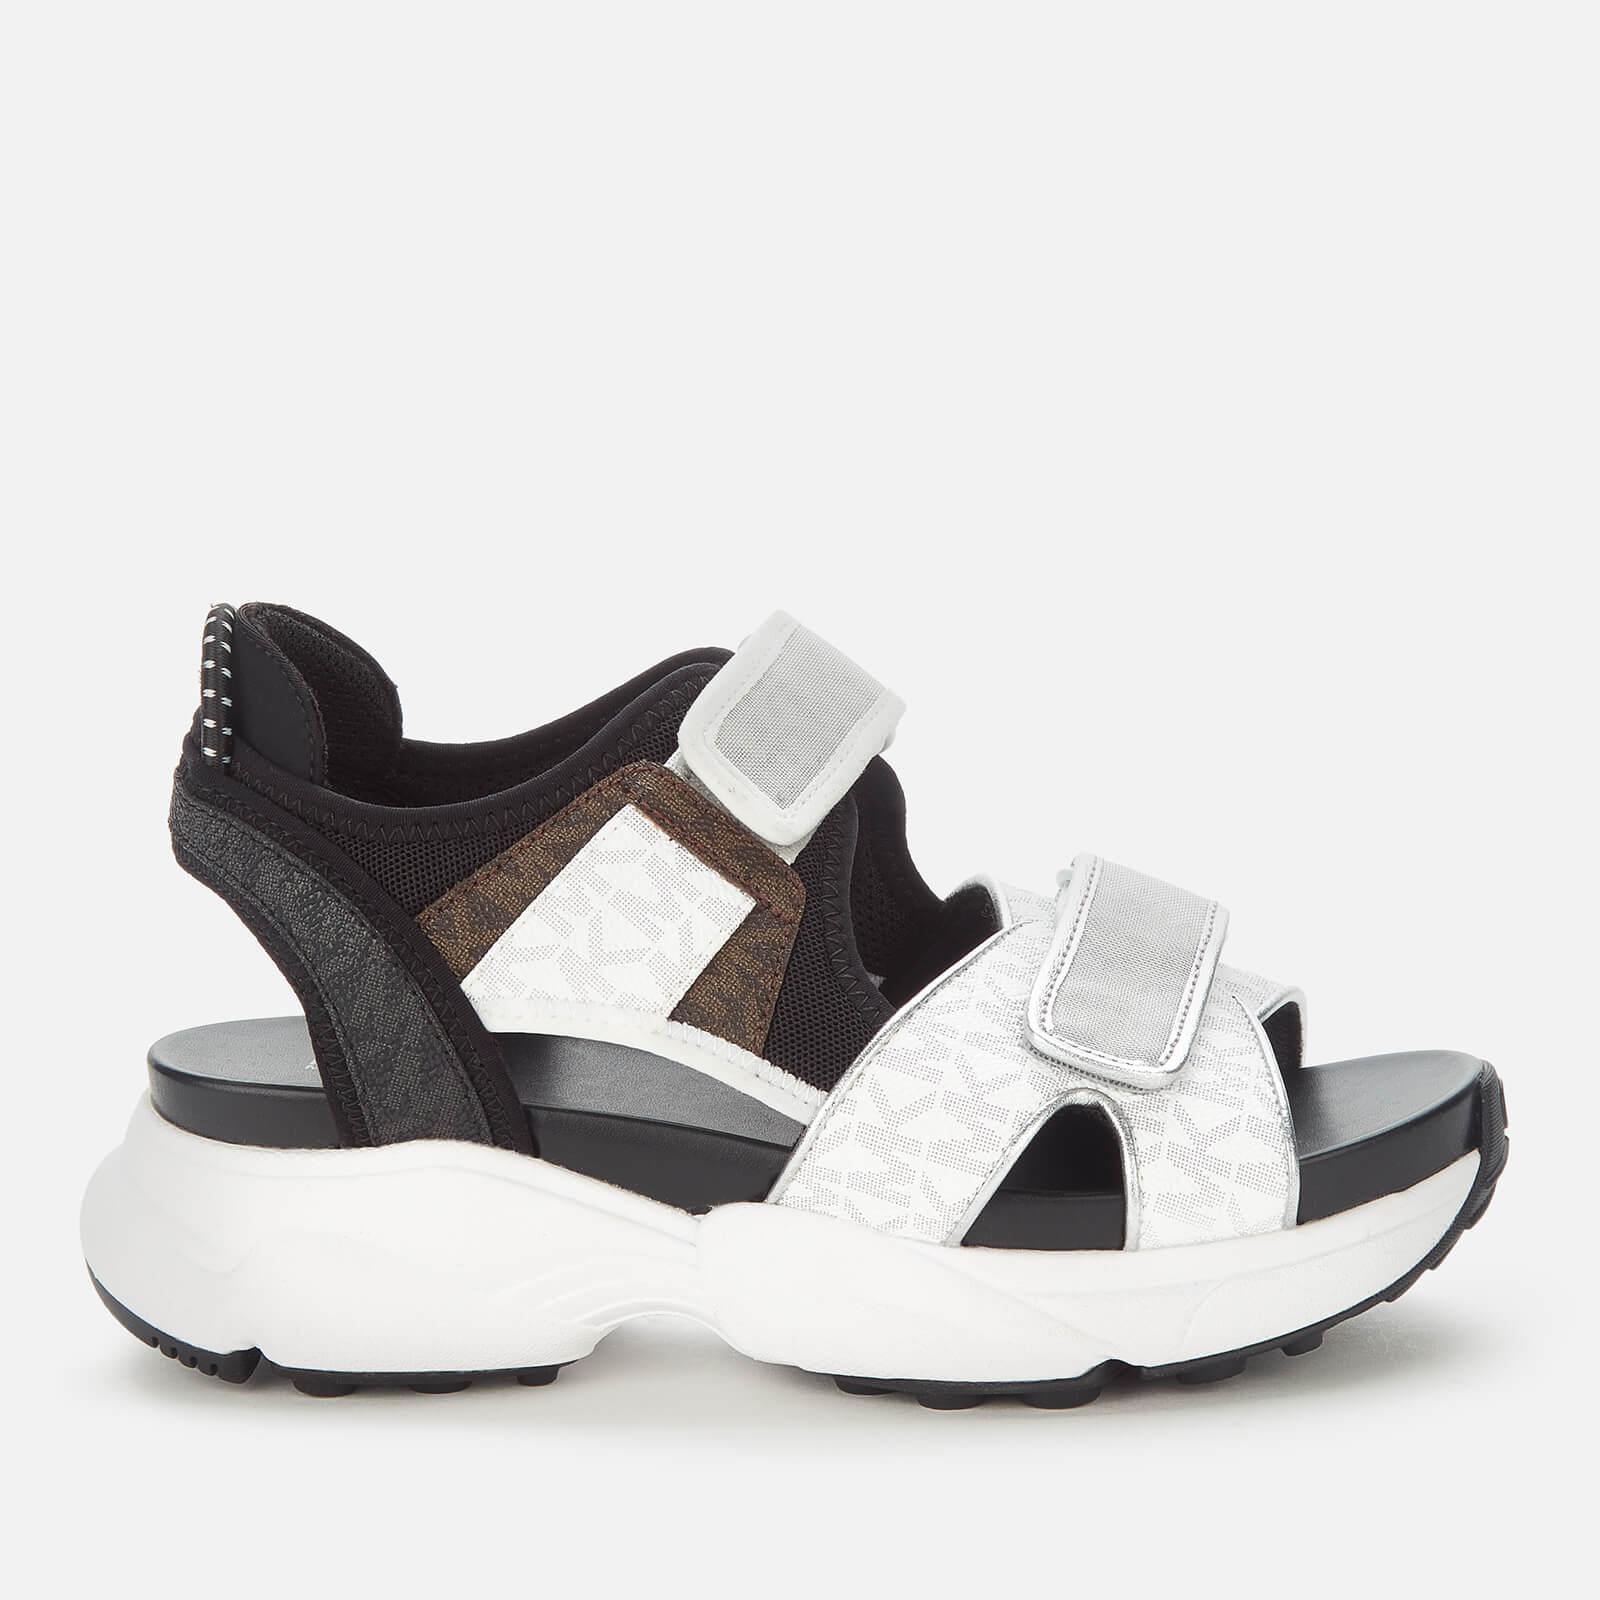 MICHAEL MICHAEL KORS Women's Harvey Chunky Sandals - Bright White - UK 7